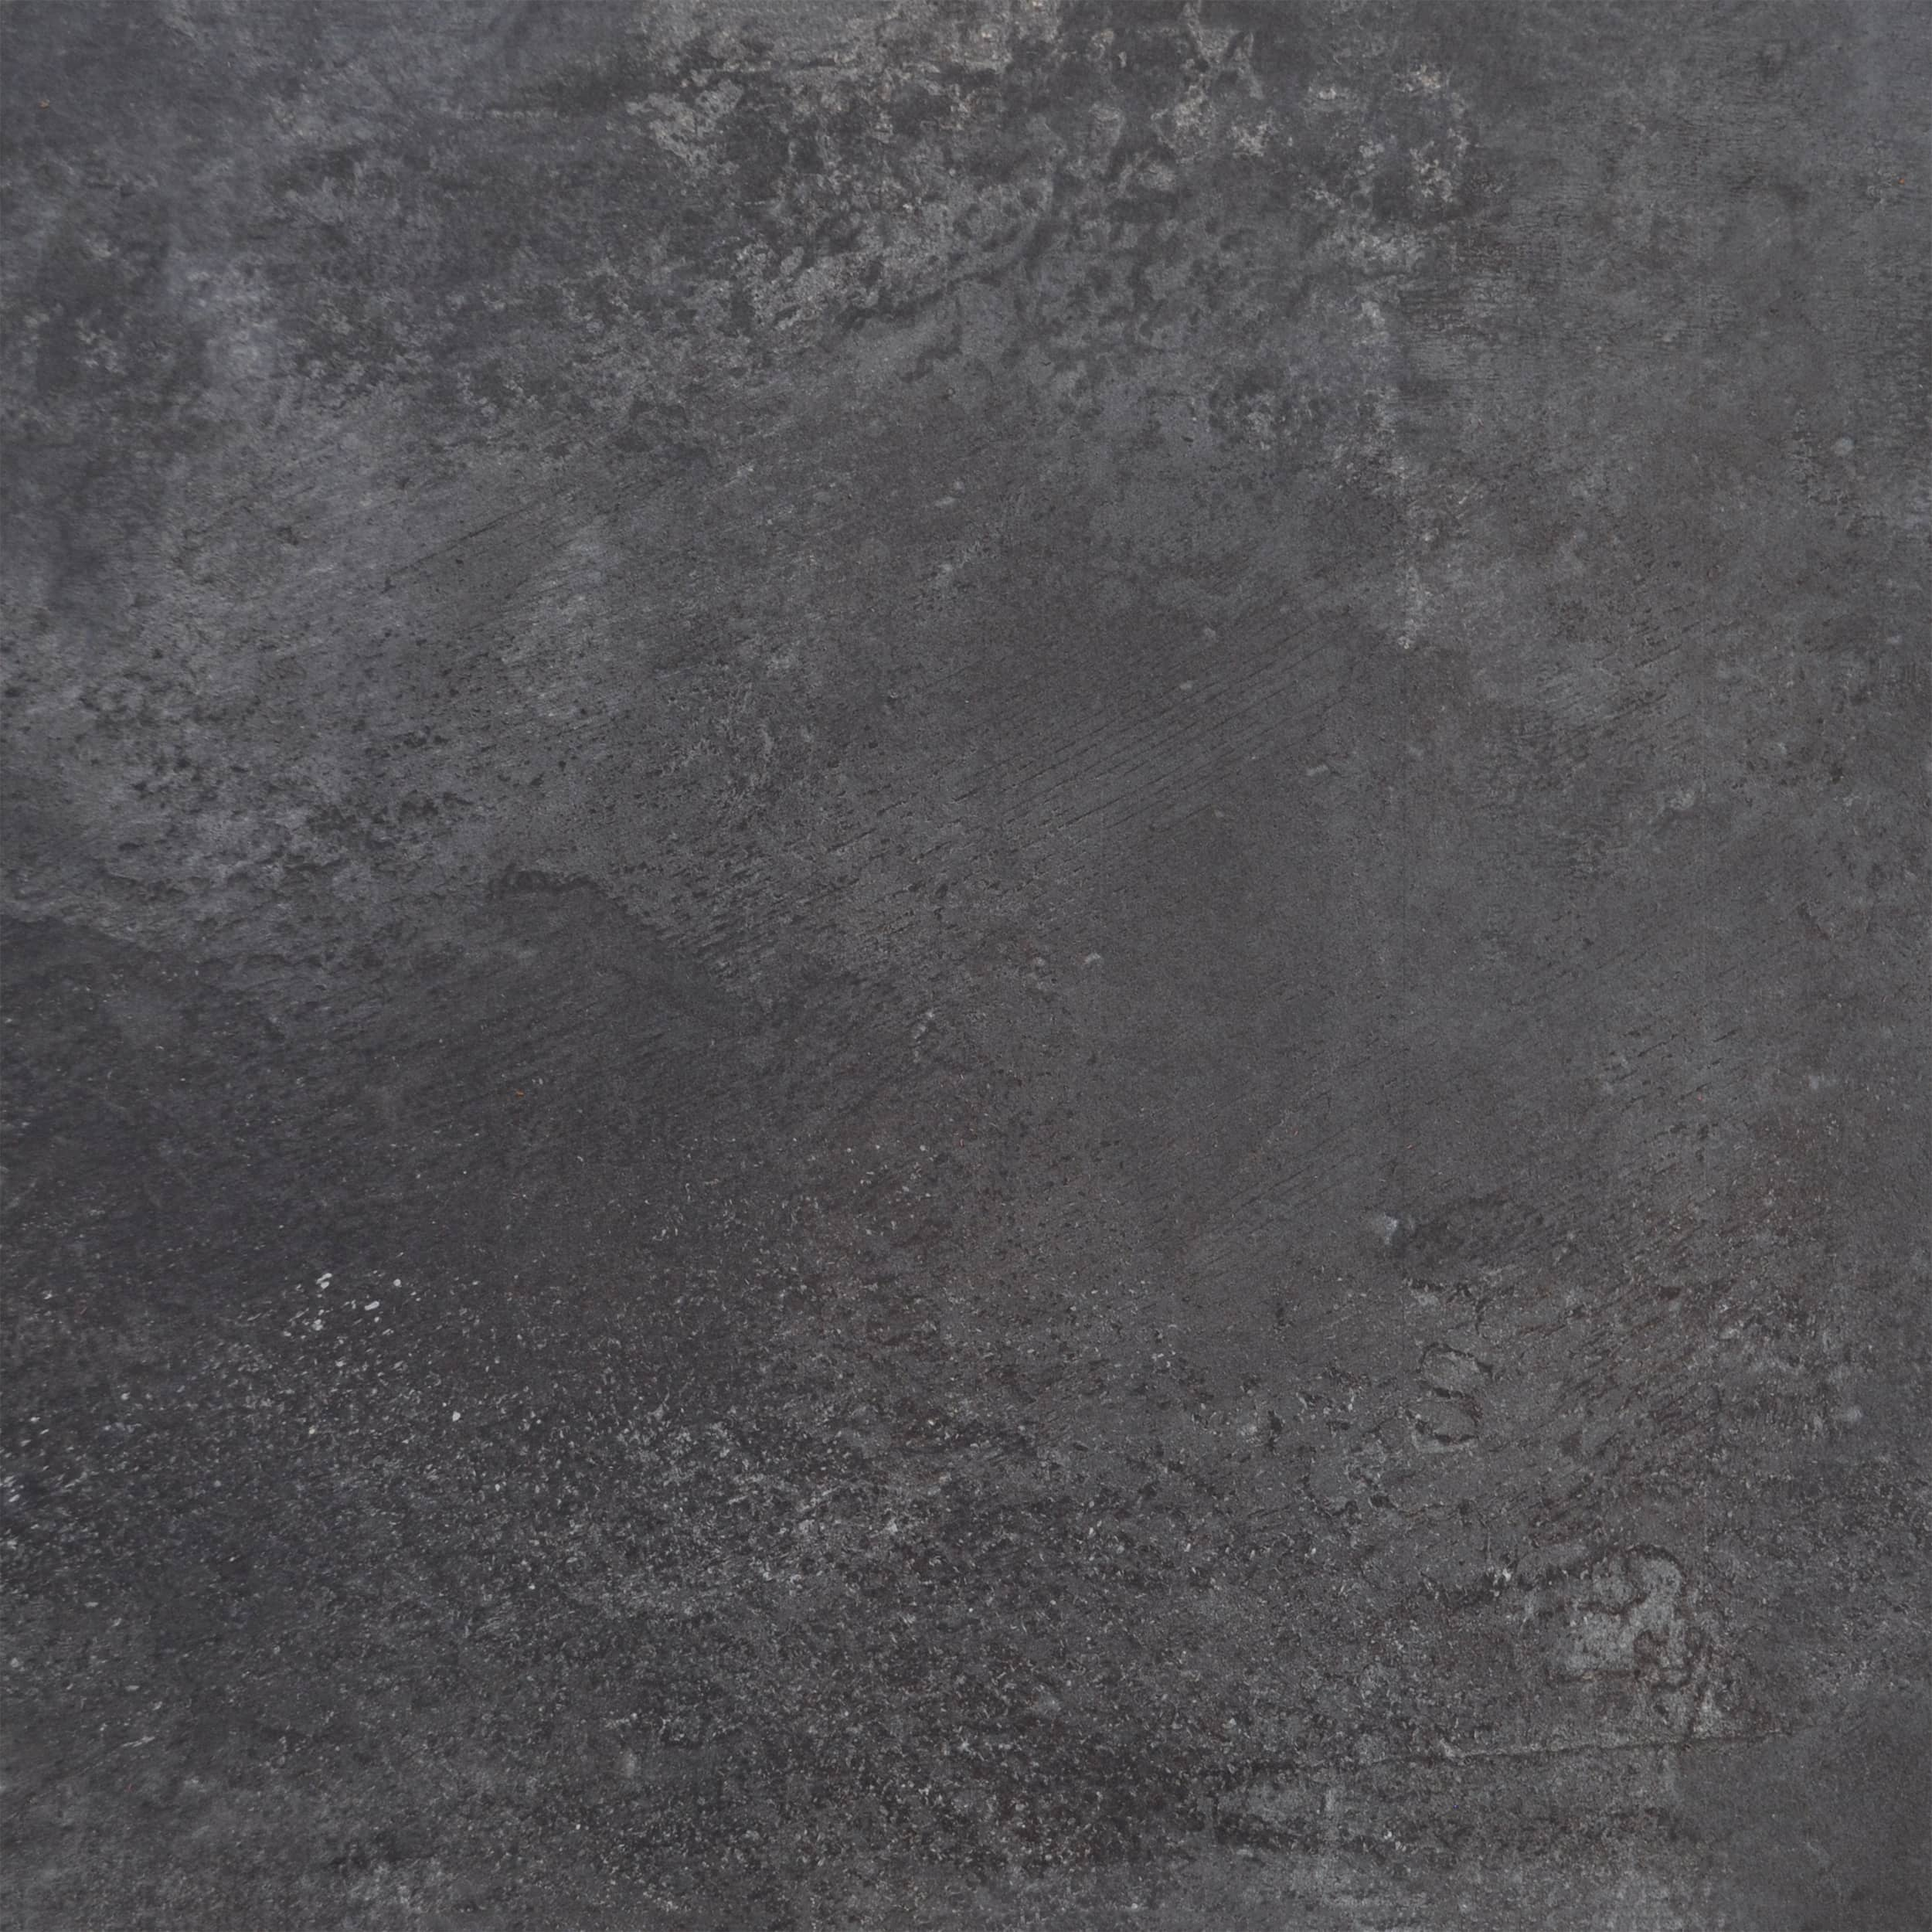 Keramik Terrassenplatte 60x60x3 cm Carbon anthrazit-metallic